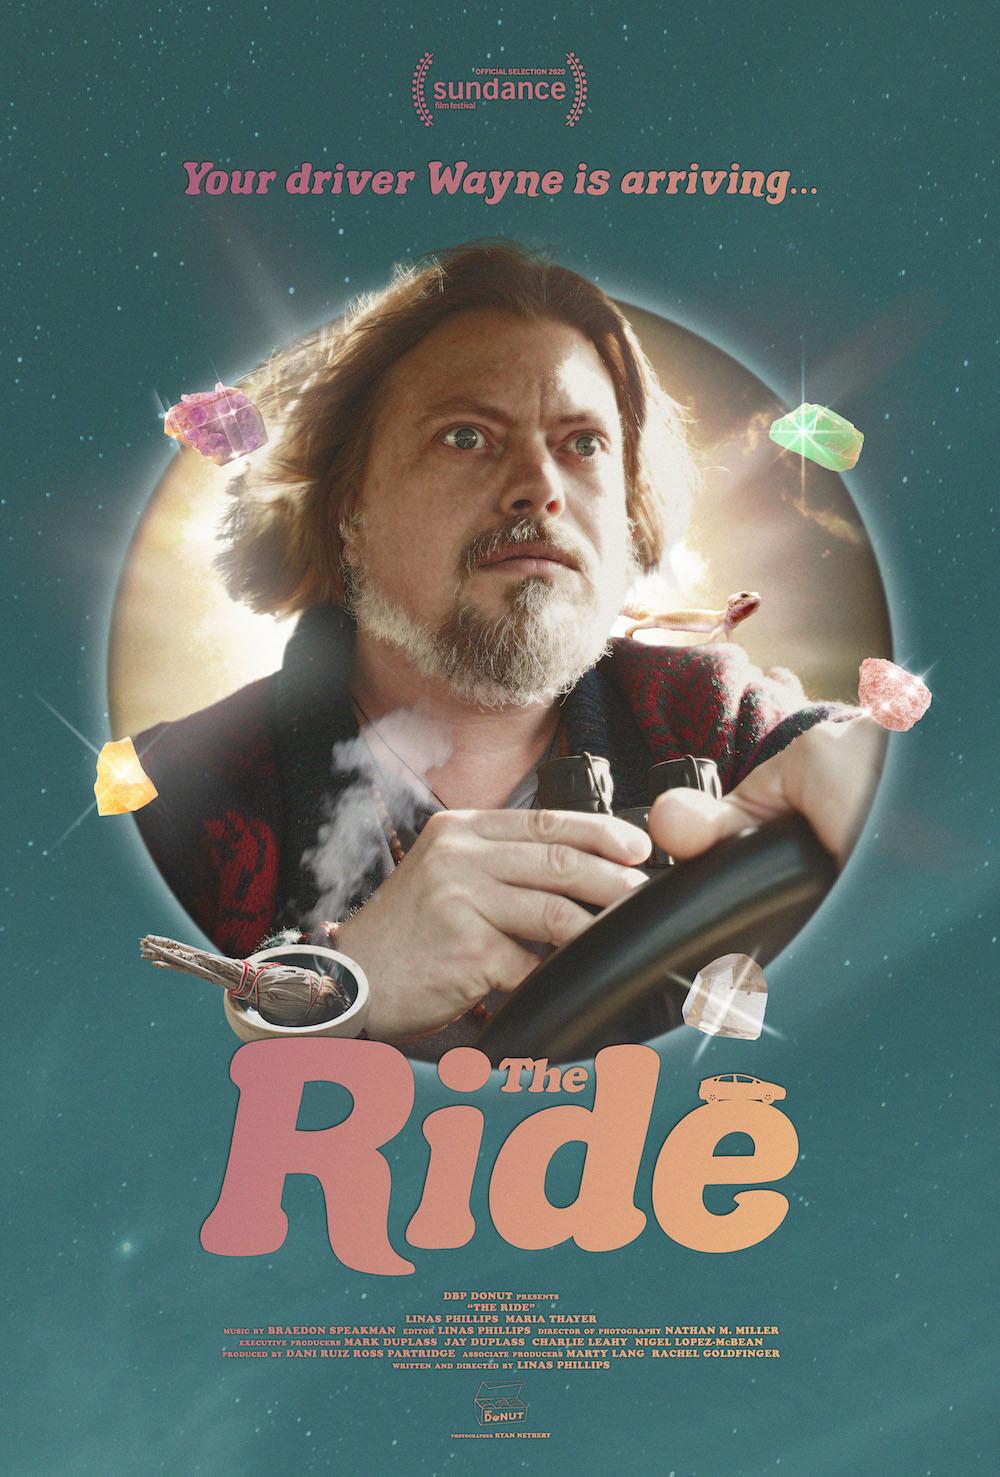 The Ride Sundance Mark Duplass